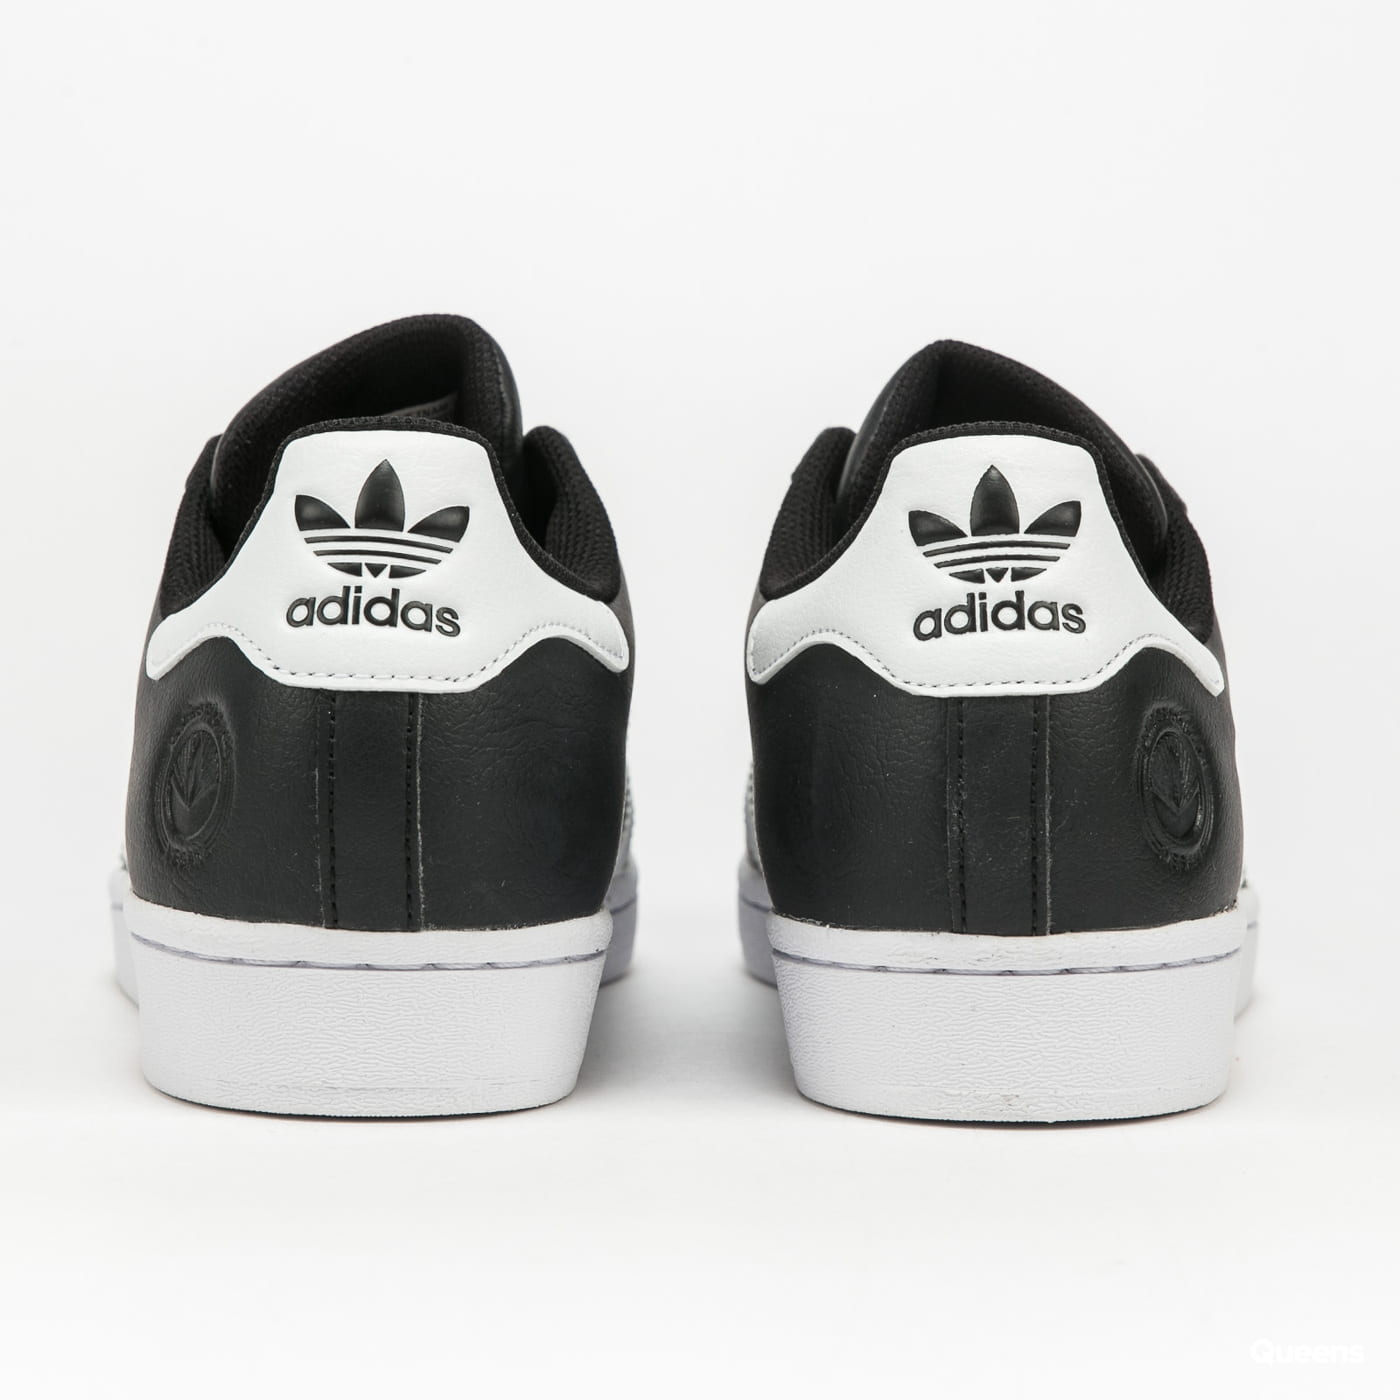 adidas Originals Superstar Vegan cblack / ftwwht / goldmt